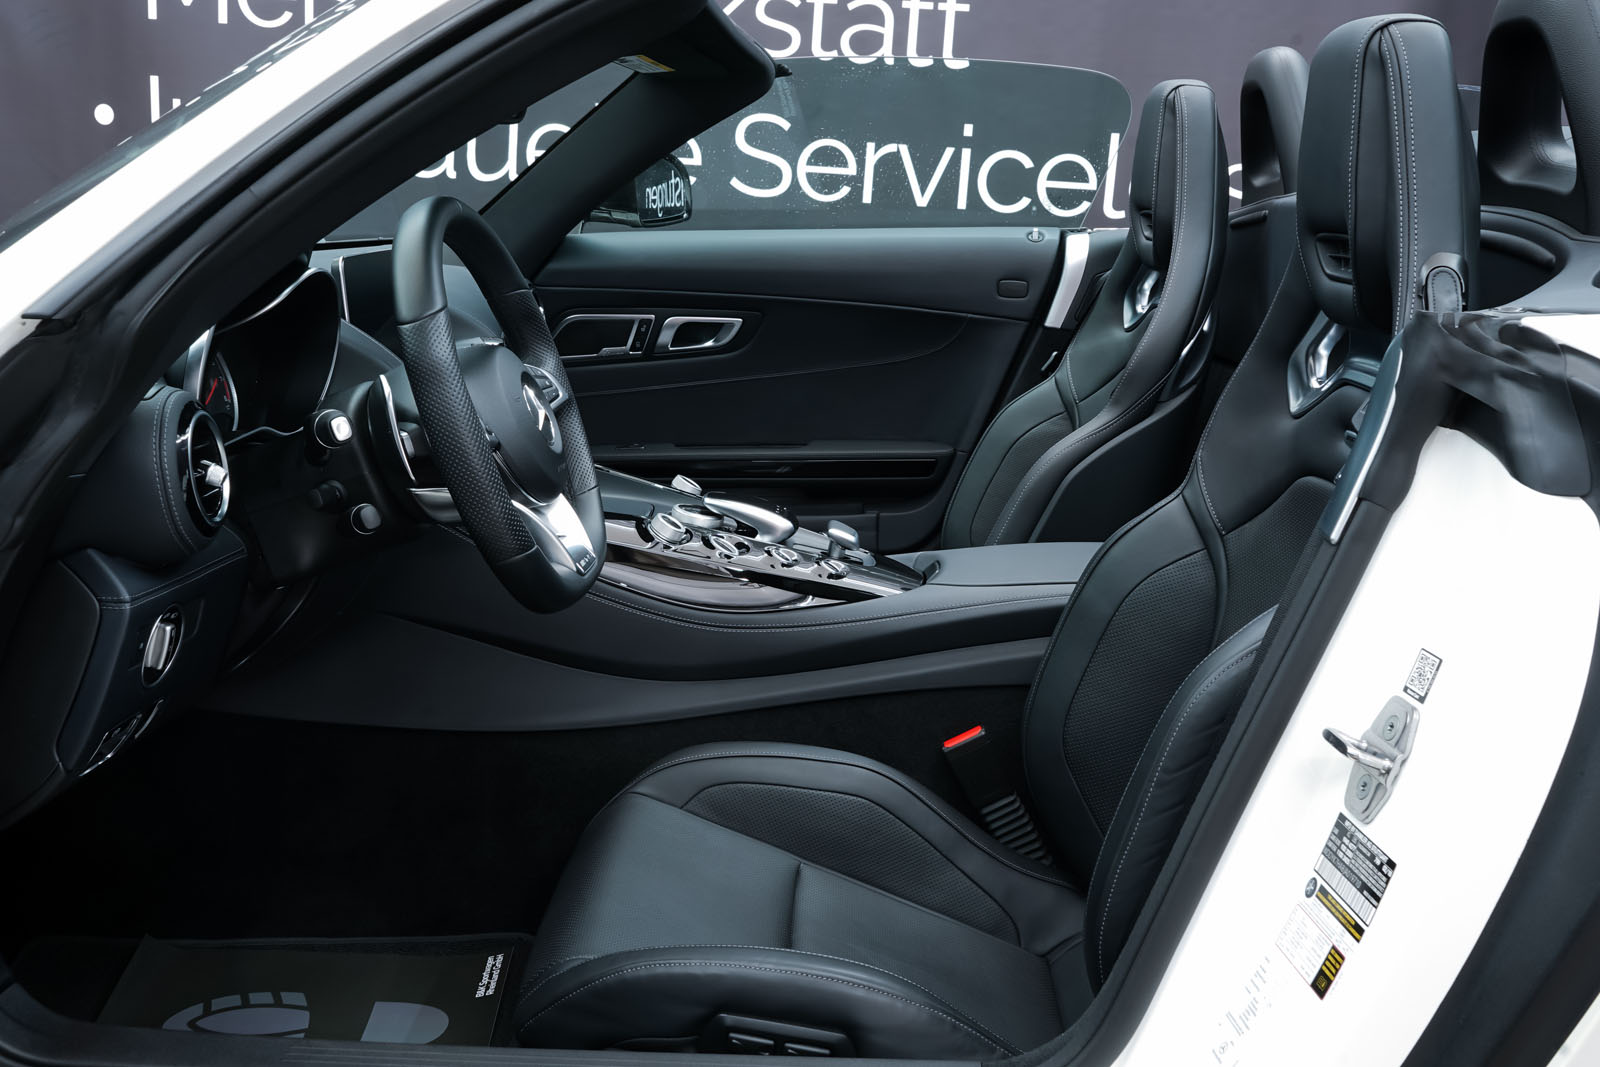 11Mercedes_Benz_AMG_GT_Roadster_Weiss_Schwarz_MB-9710_8_w